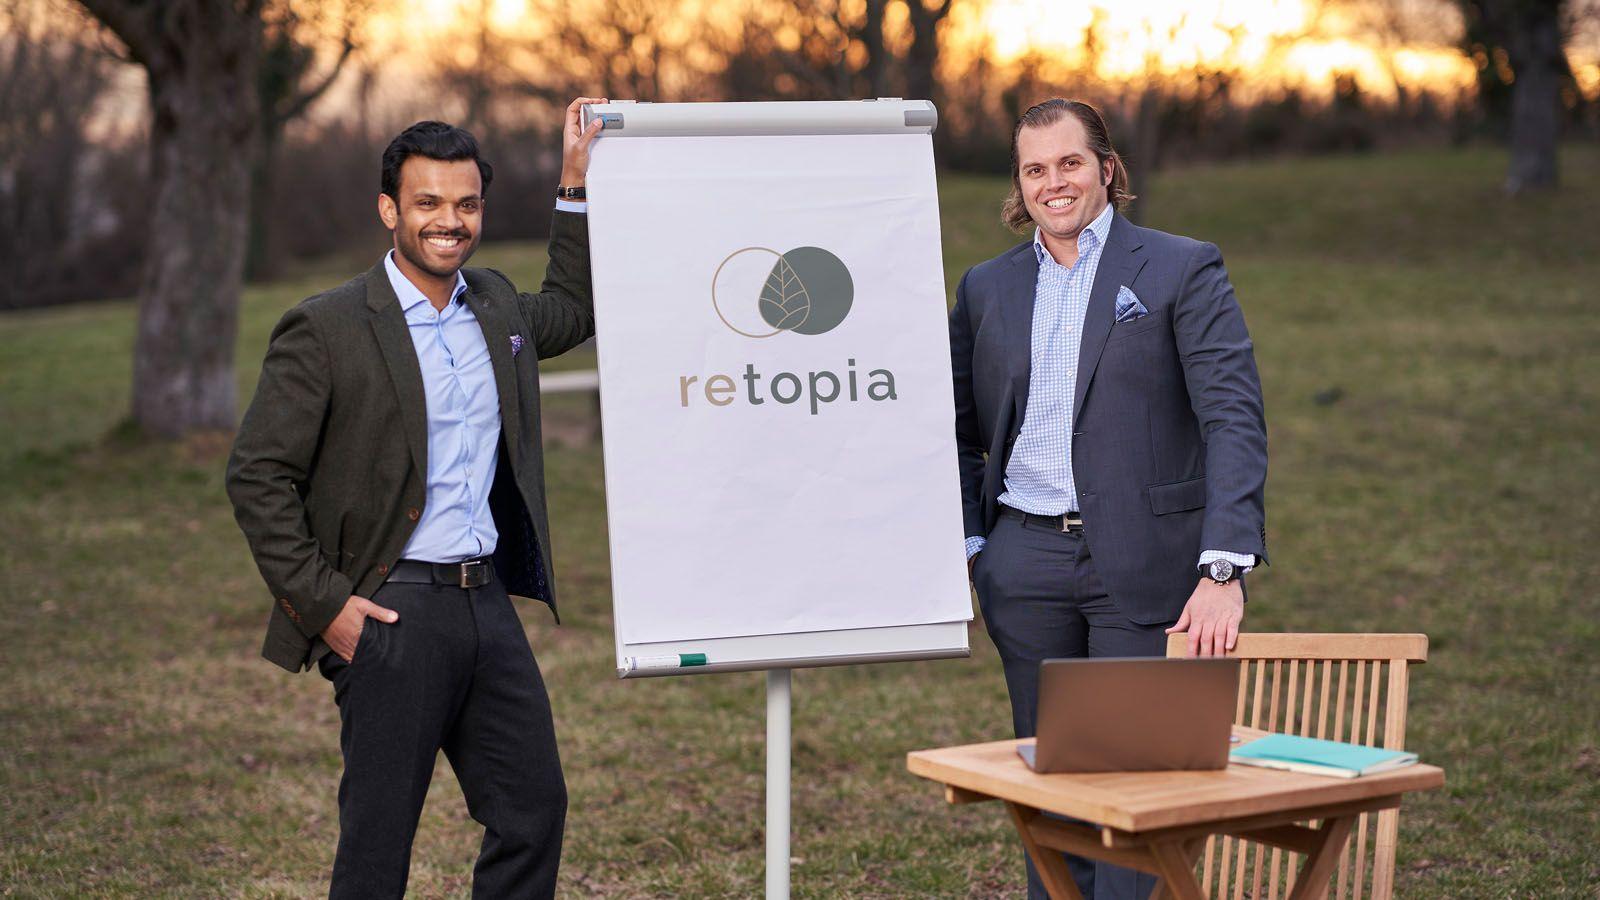 Neugr-ndung-Retopia-ber-t-bei-Nachhaltigkeitsstrategien